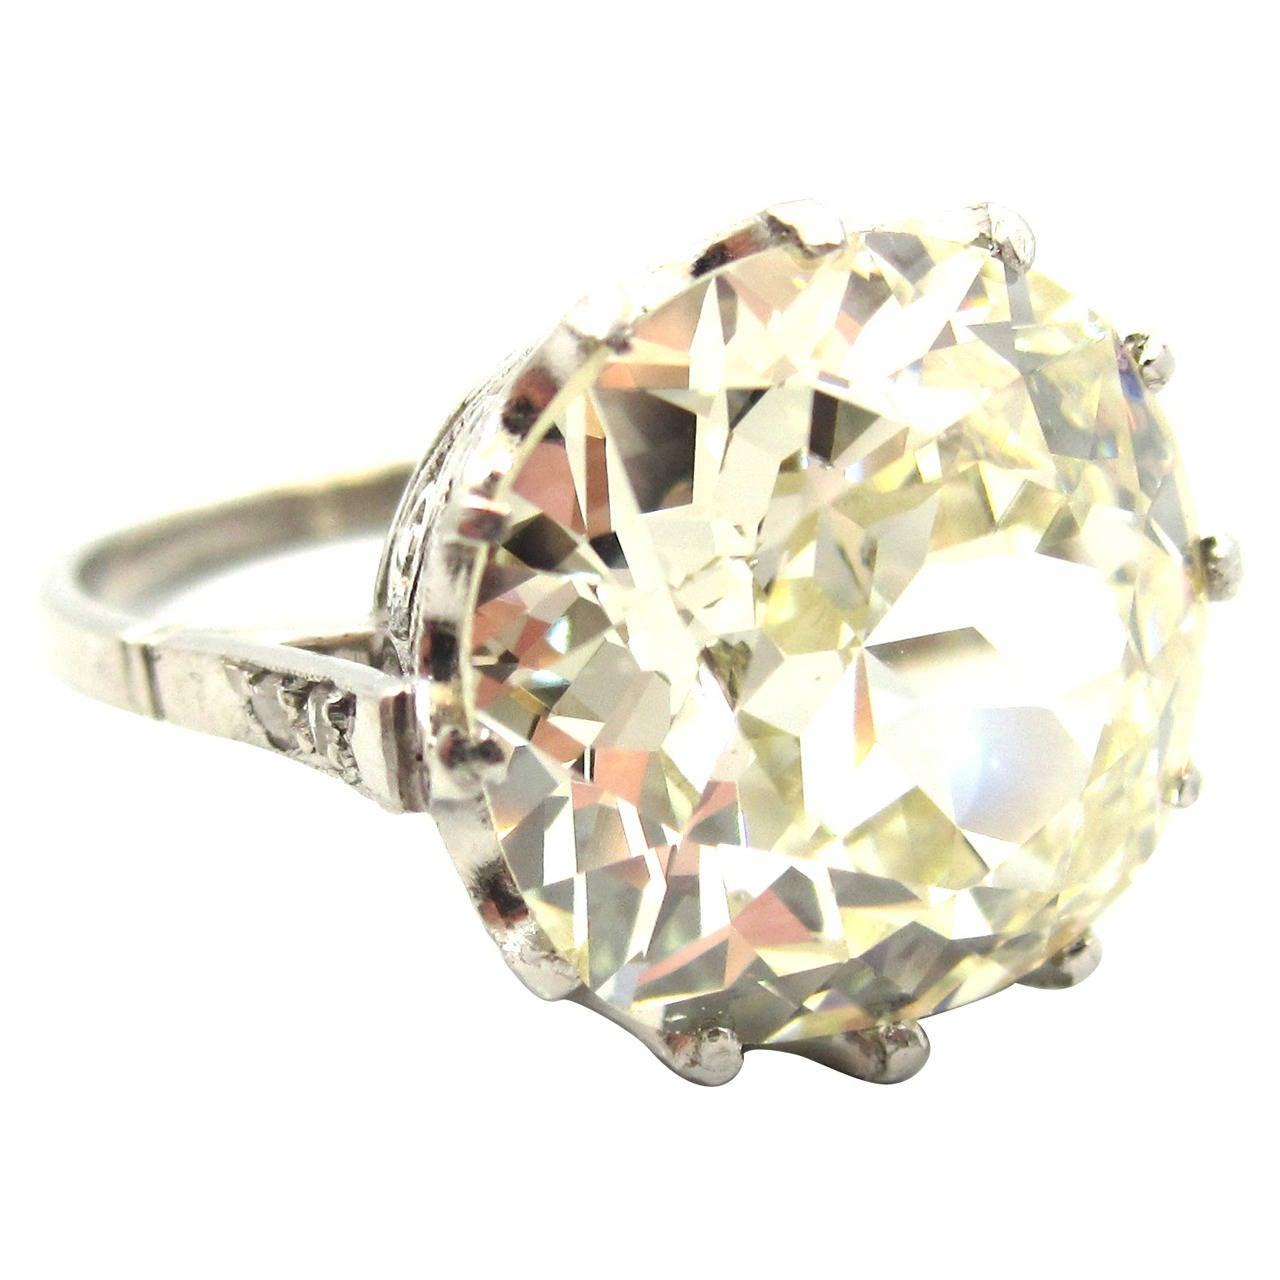 Incredible Edwardian 7 66 Carat Cushion Cut Diamond Crown